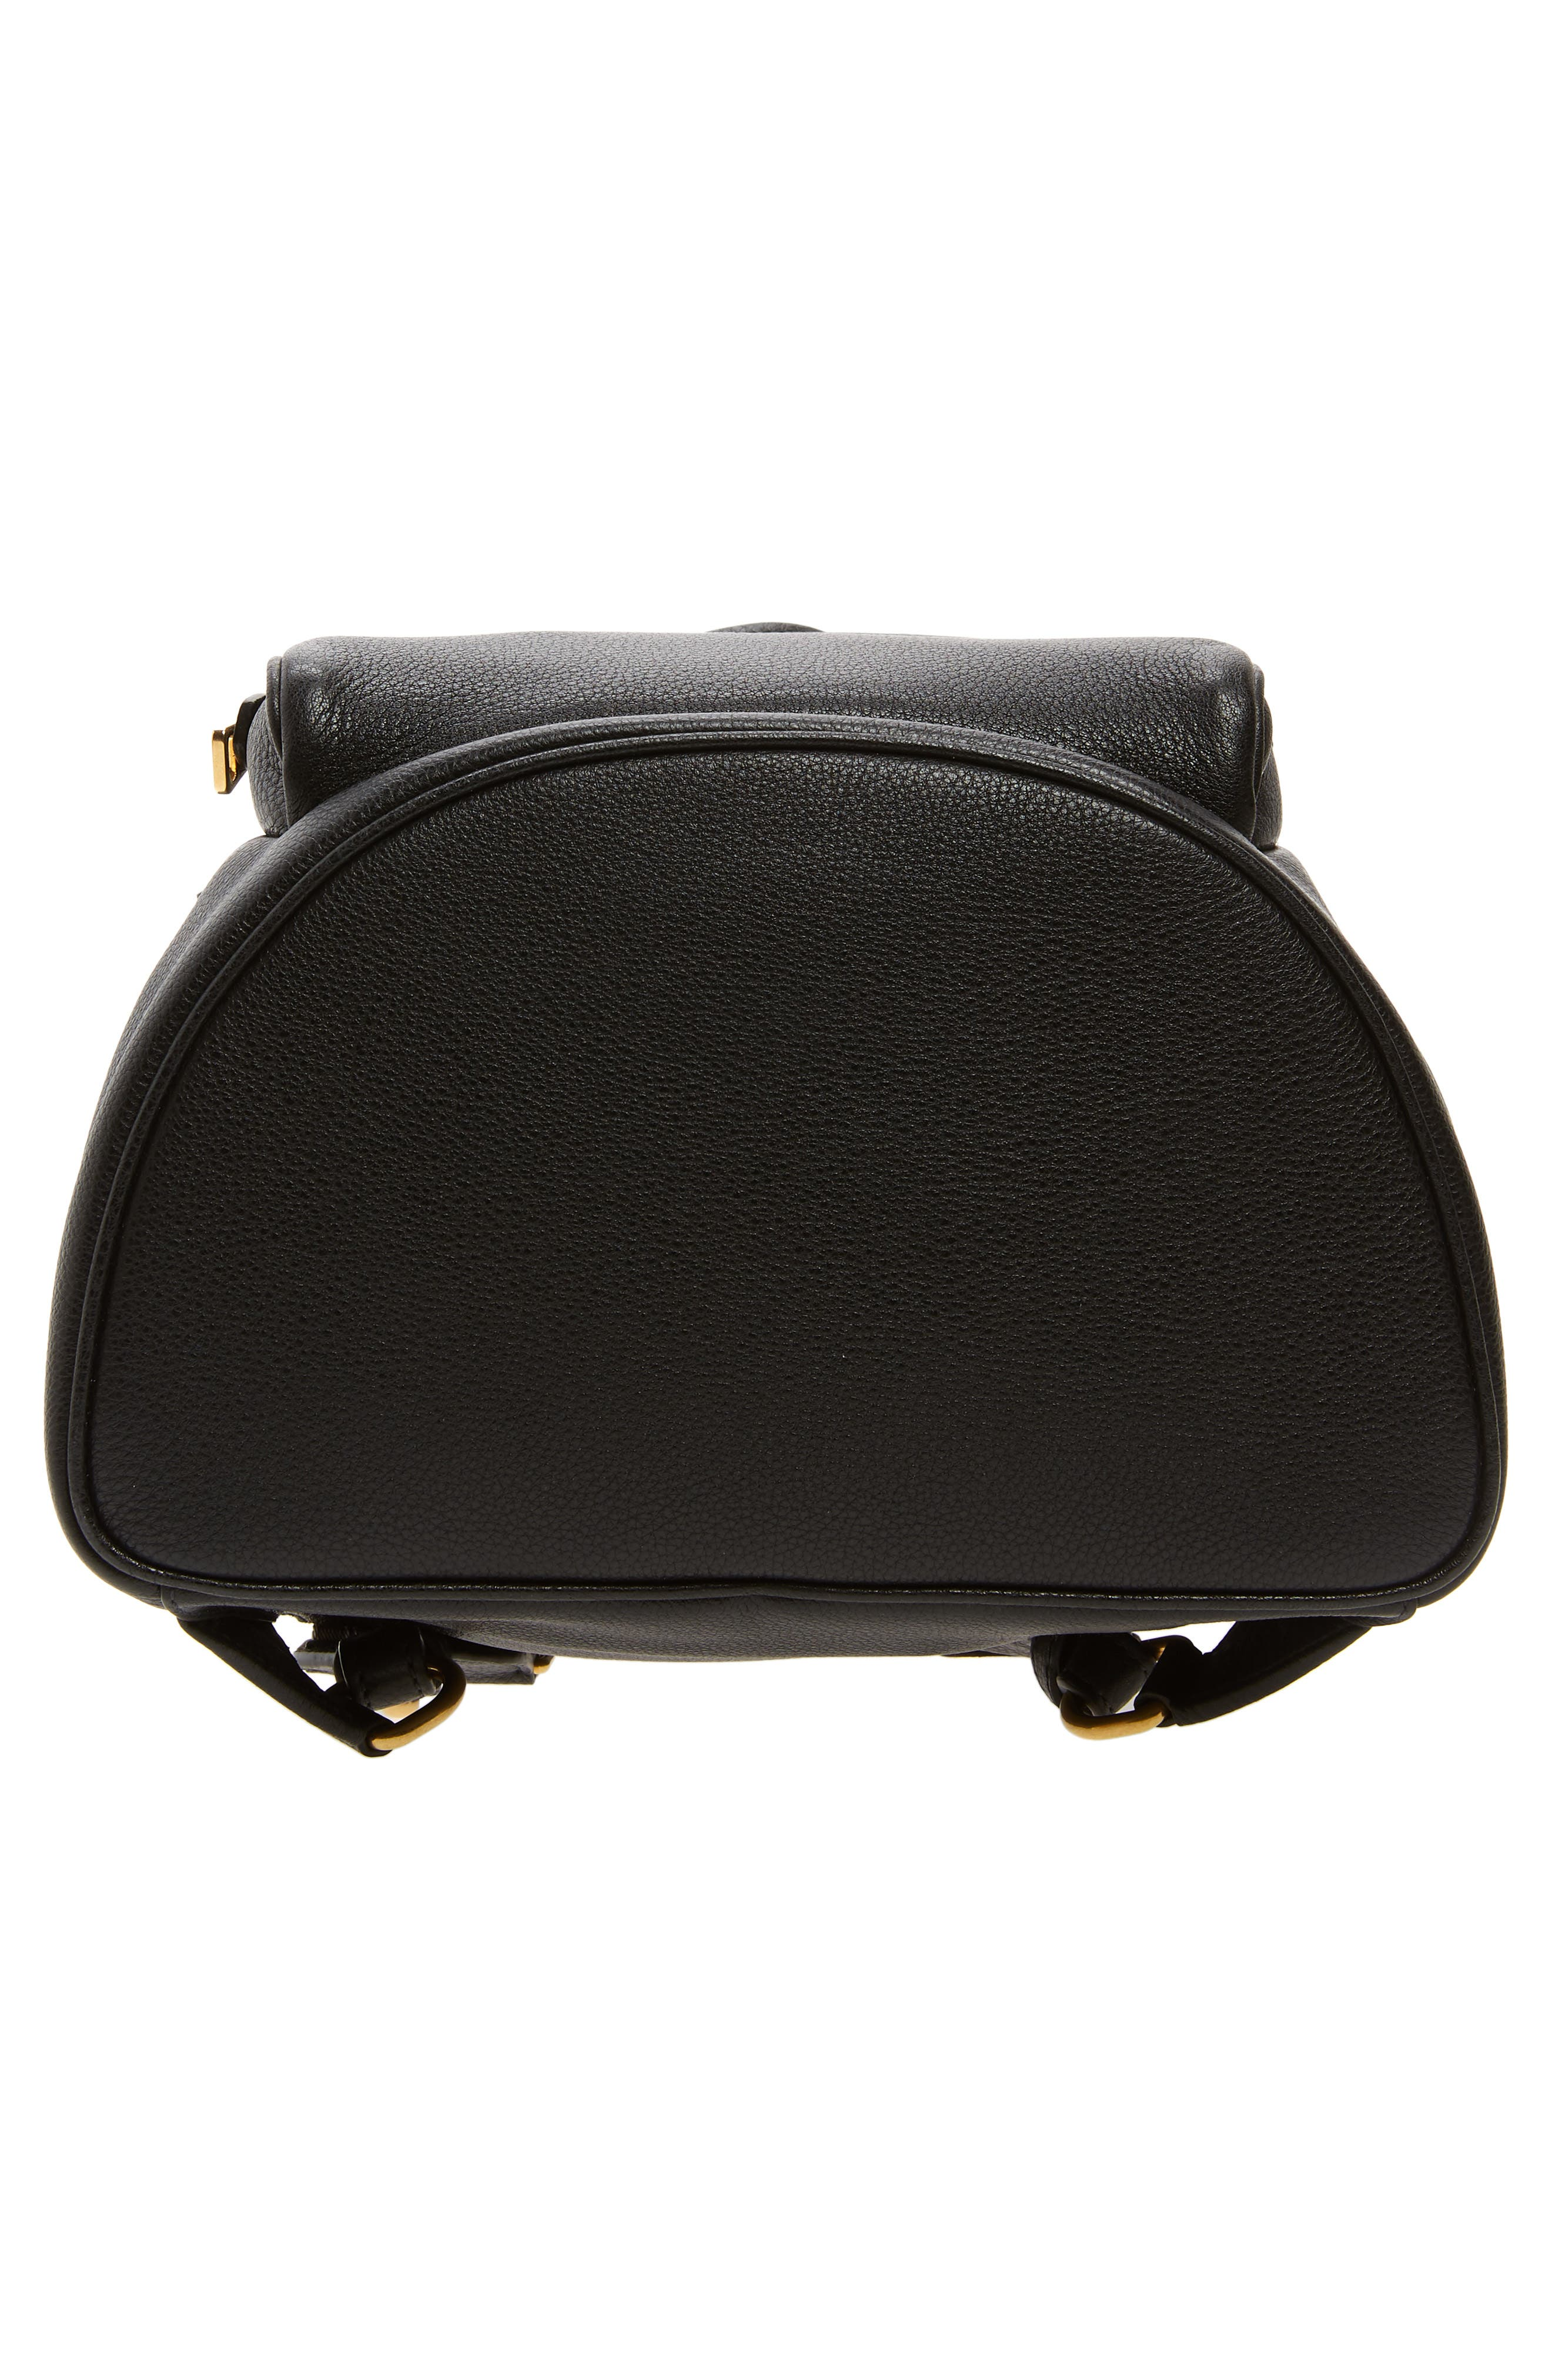 PRADA, Vitello Daino Pebbled Leather Backpack, Alternate thumbnail 7, color, 001